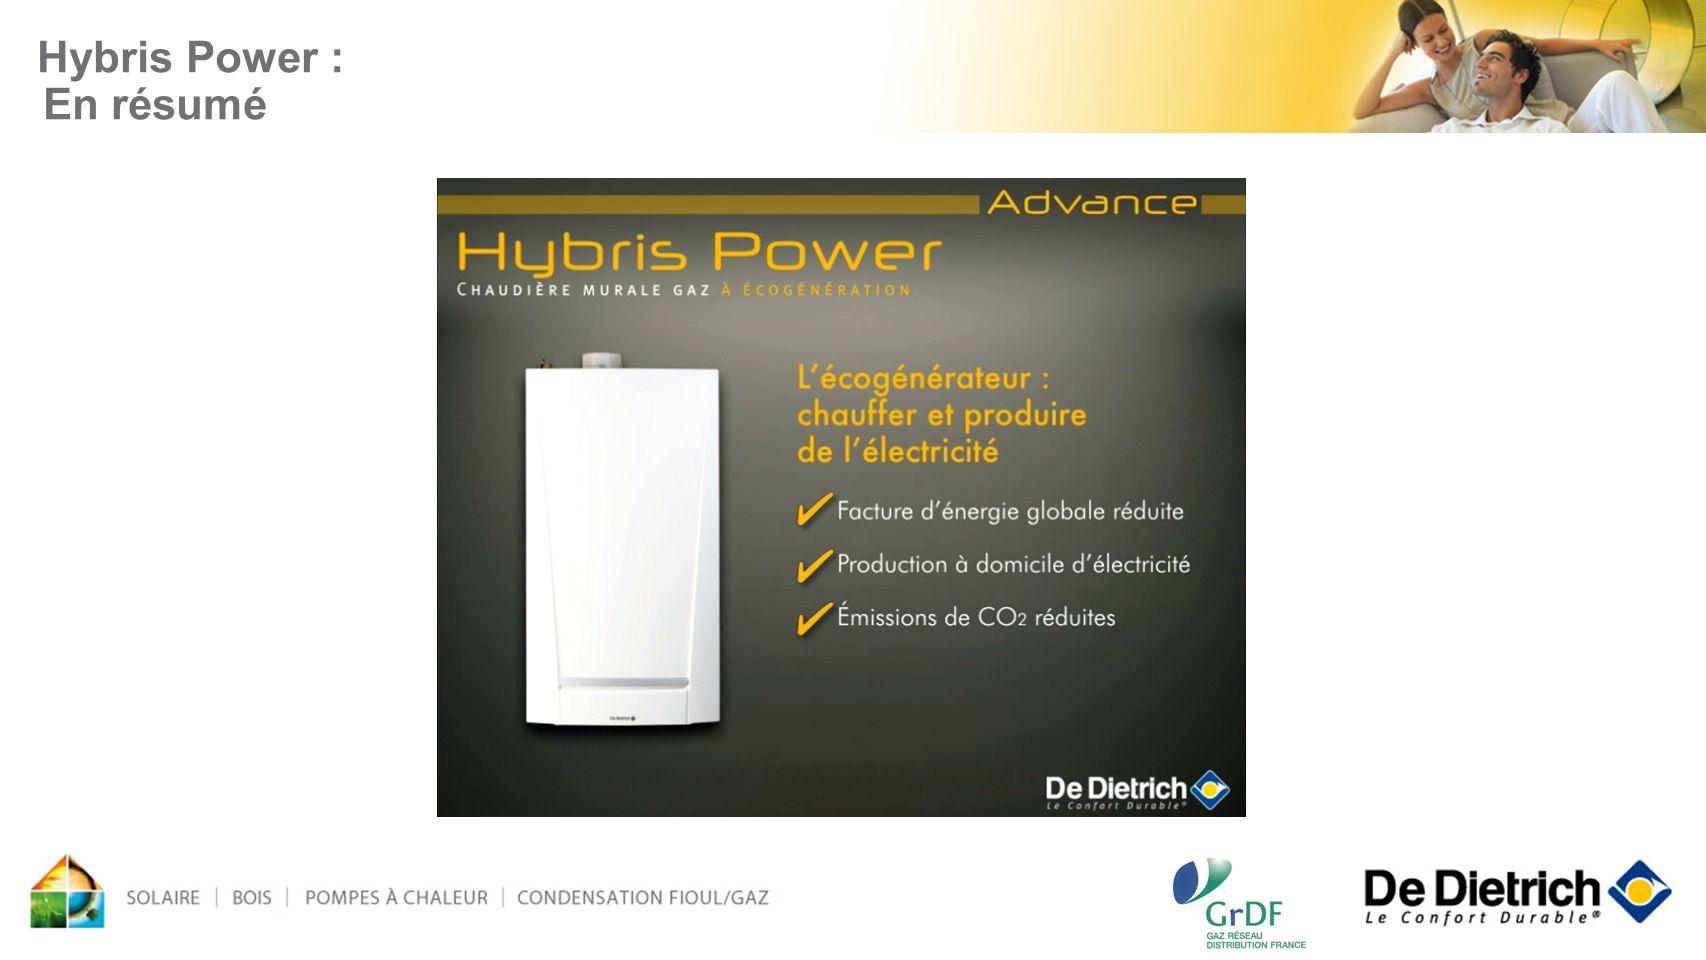 Hybris Power : En résumé